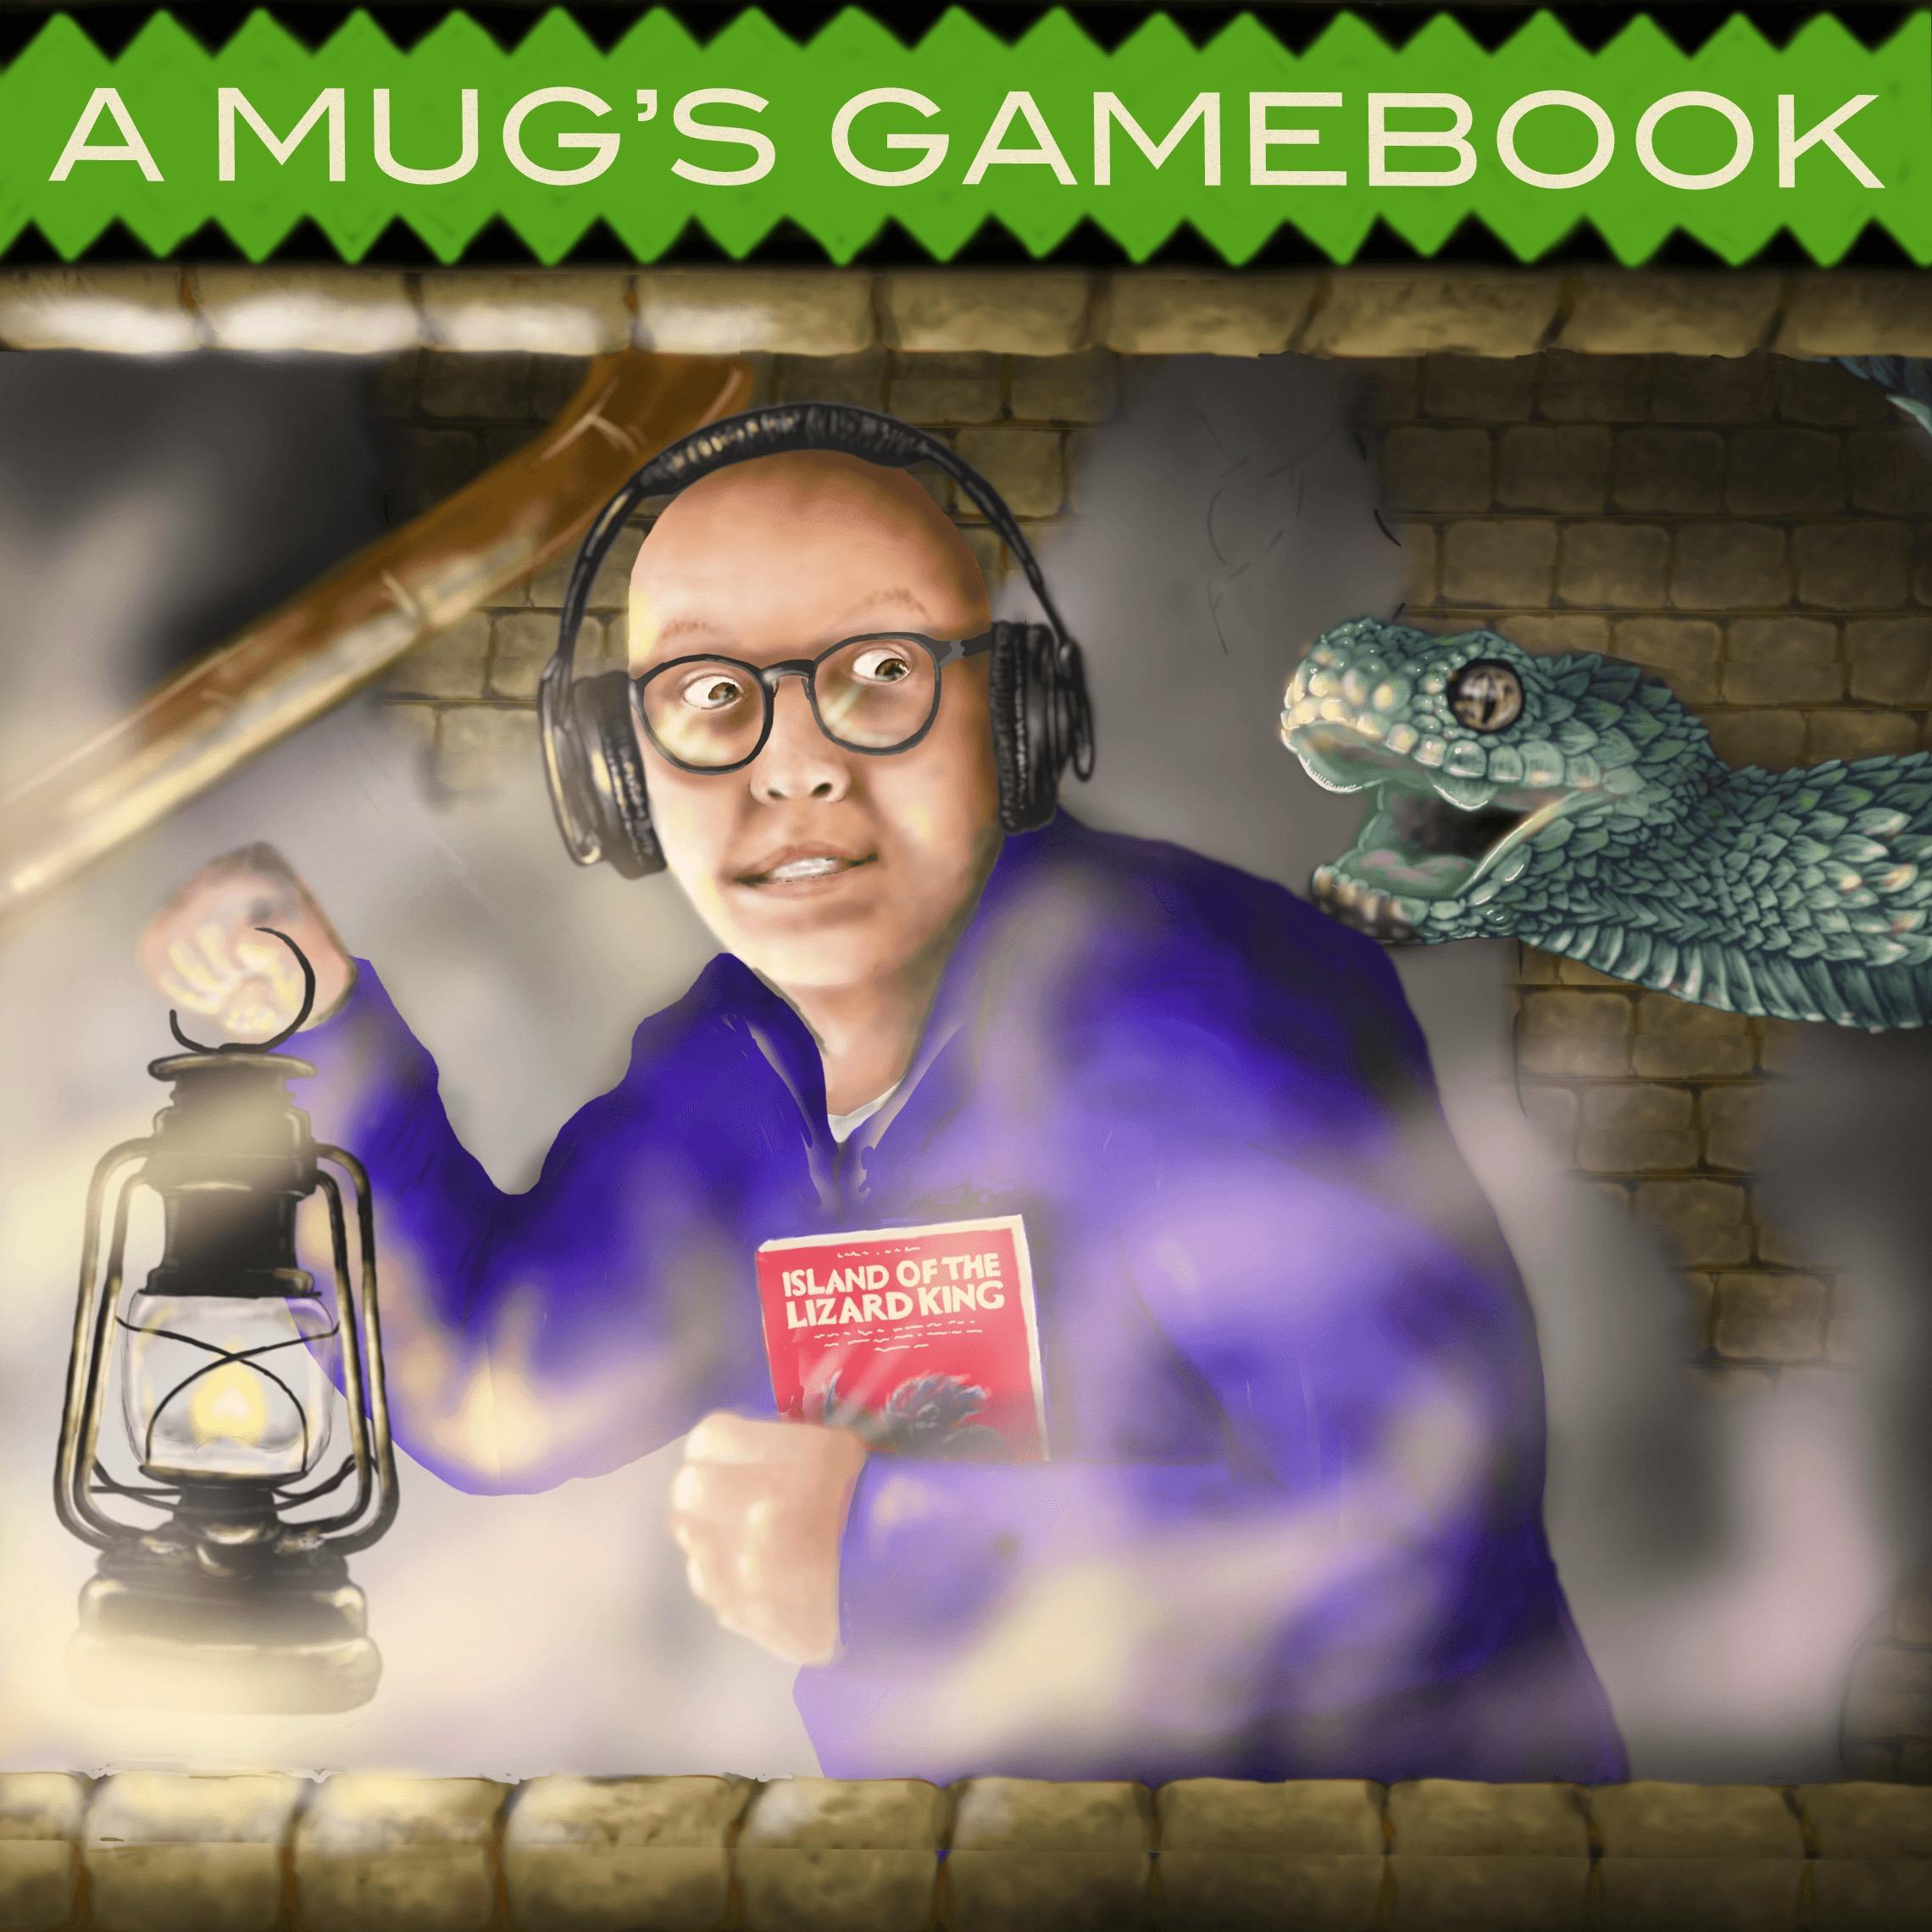 A Mug's Gamebook